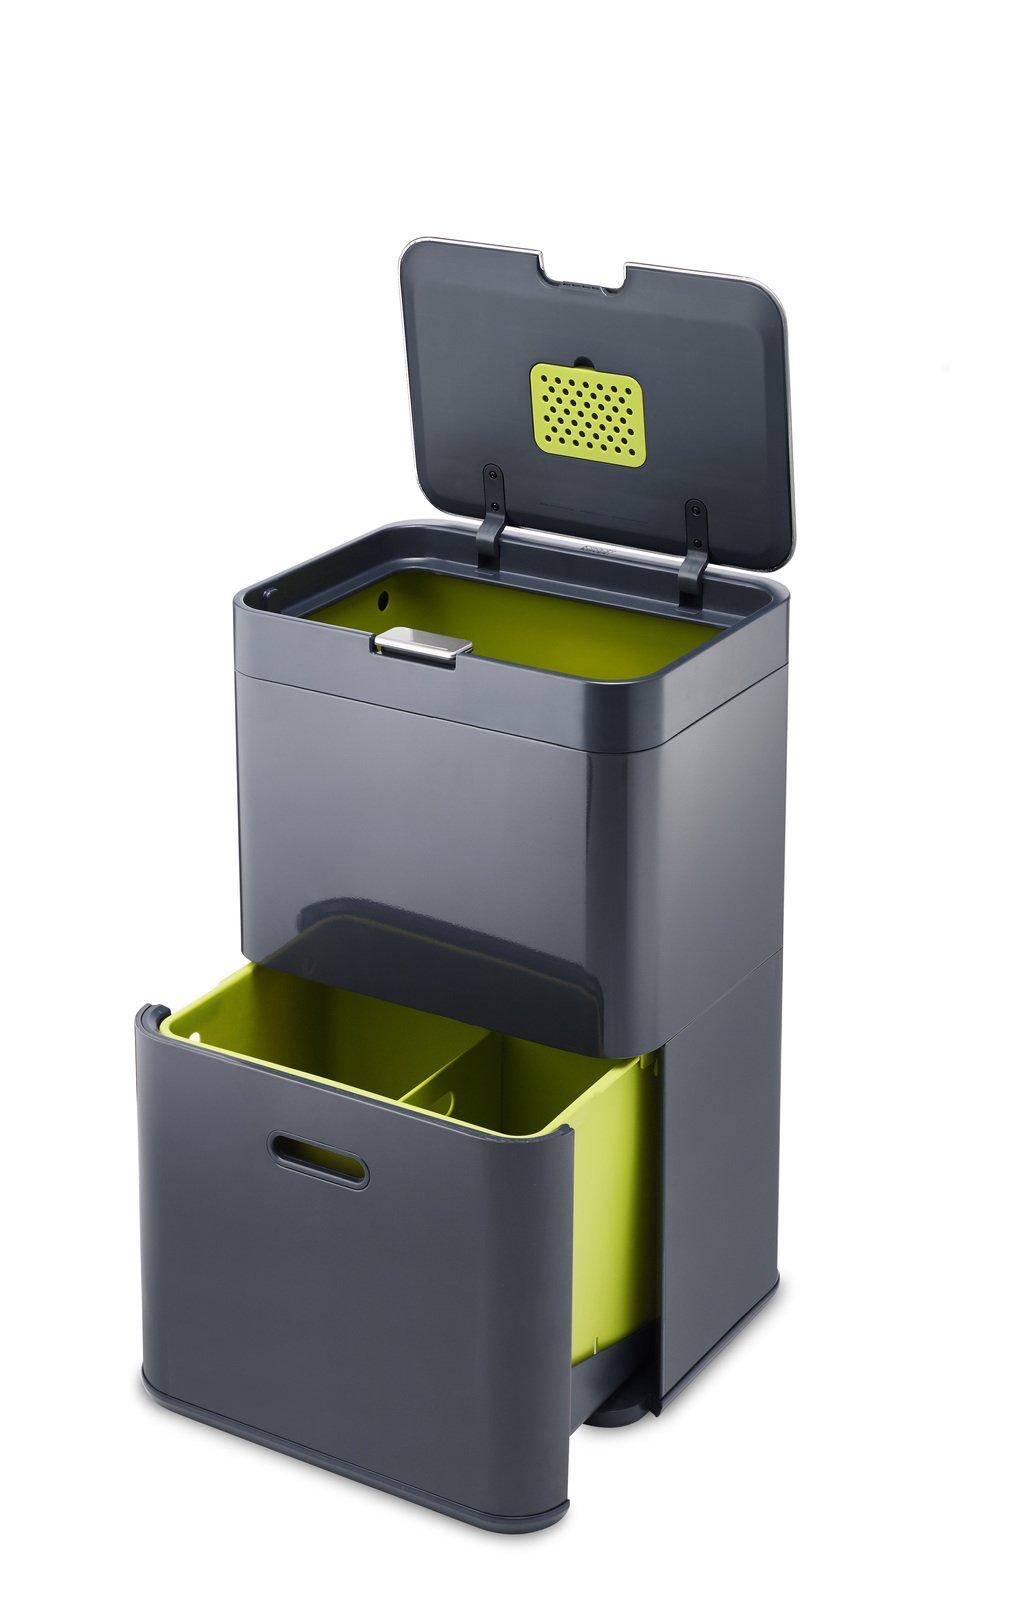 Joseph Joseph 30020 Intelligent Waste Totem Trash Can and Recycler Unit Garbage Can Recycling Bin, 13-gallon, Gray by Joseph Joseph